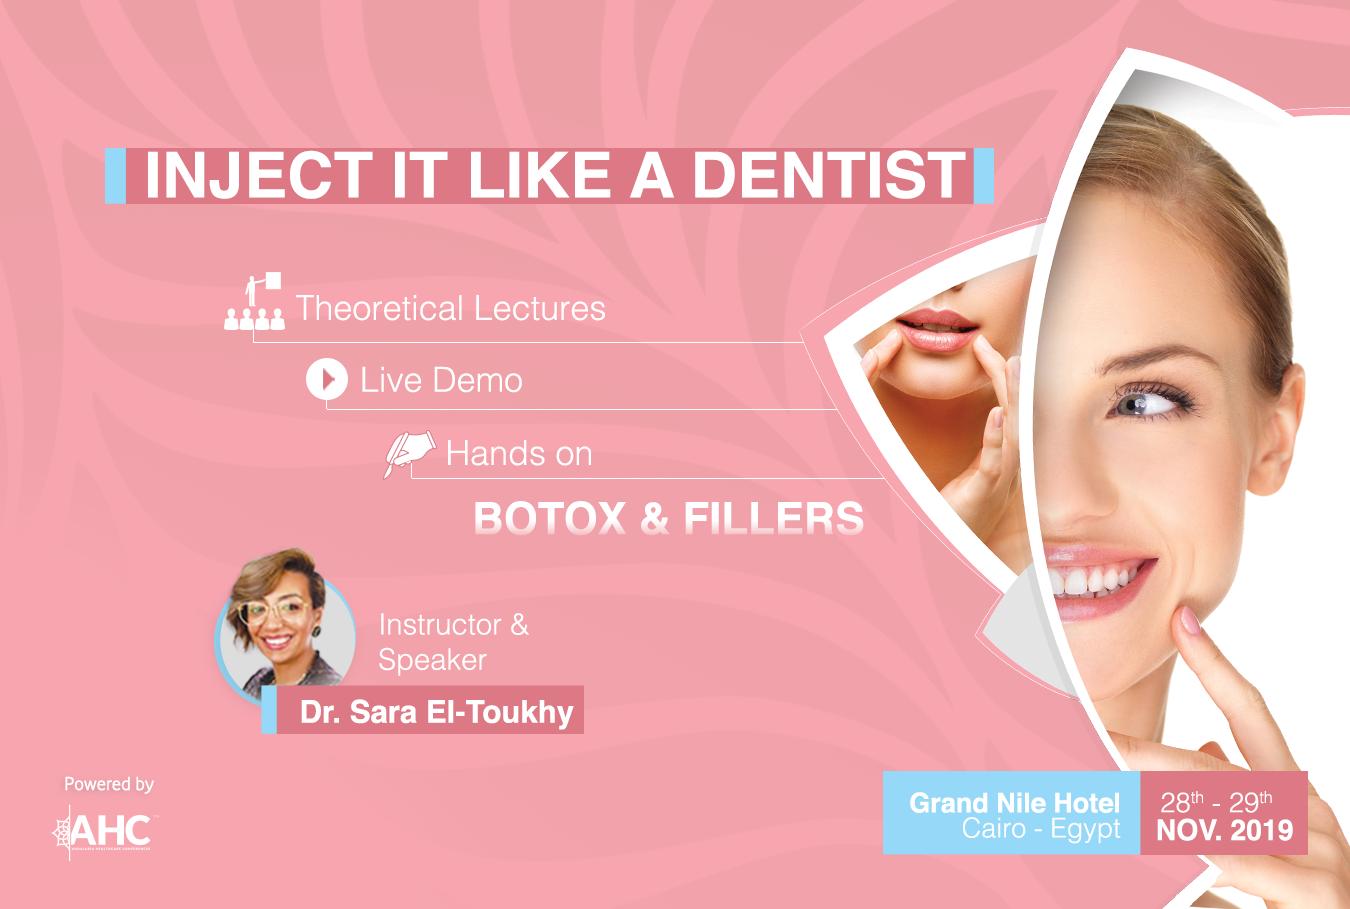 Inject it like a dentist